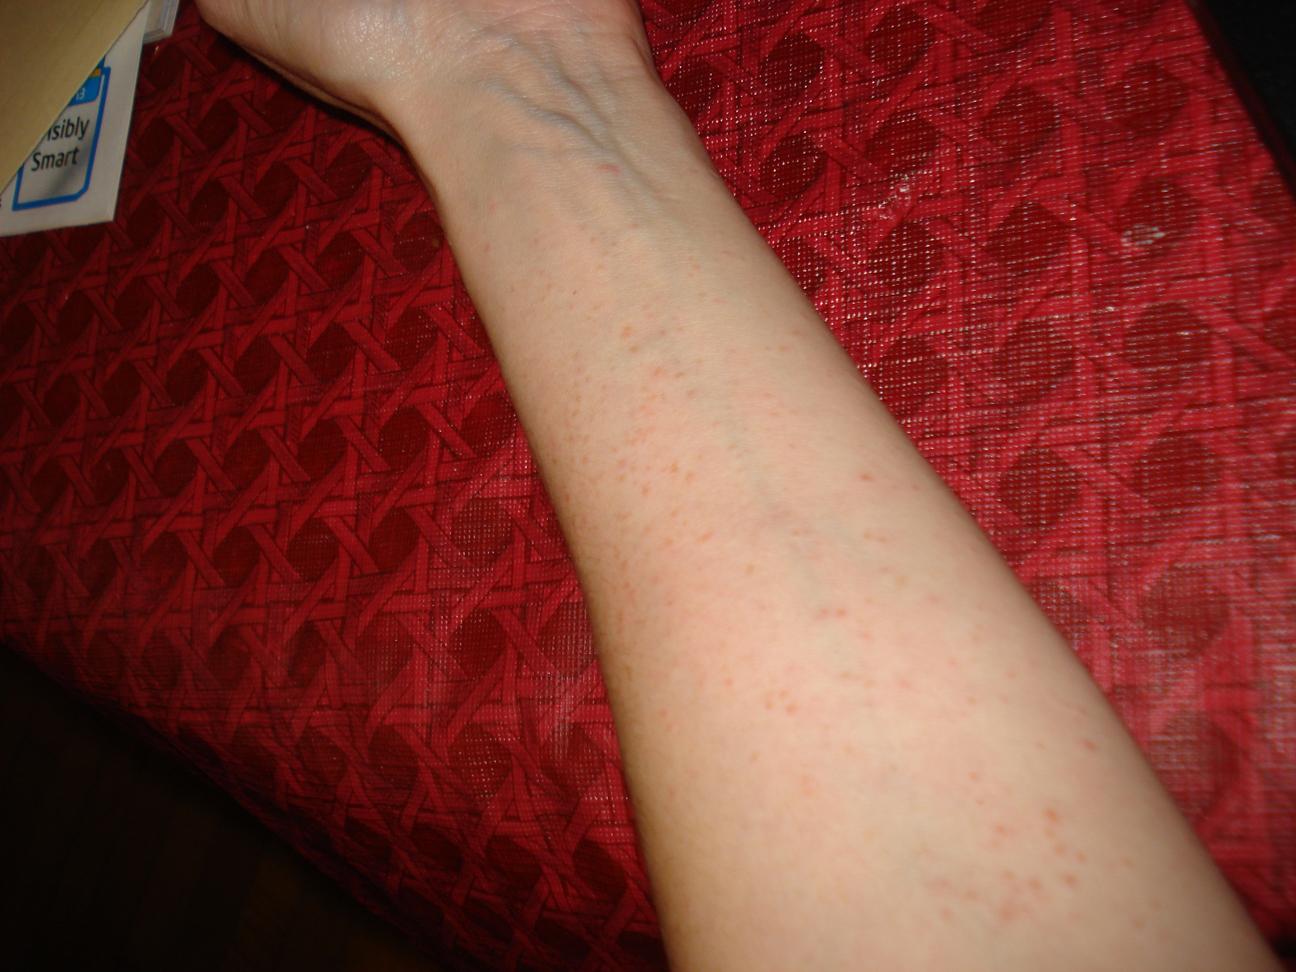 Diagnosis: Atopic Dermatitis | The Woo Woo Teacup Journal